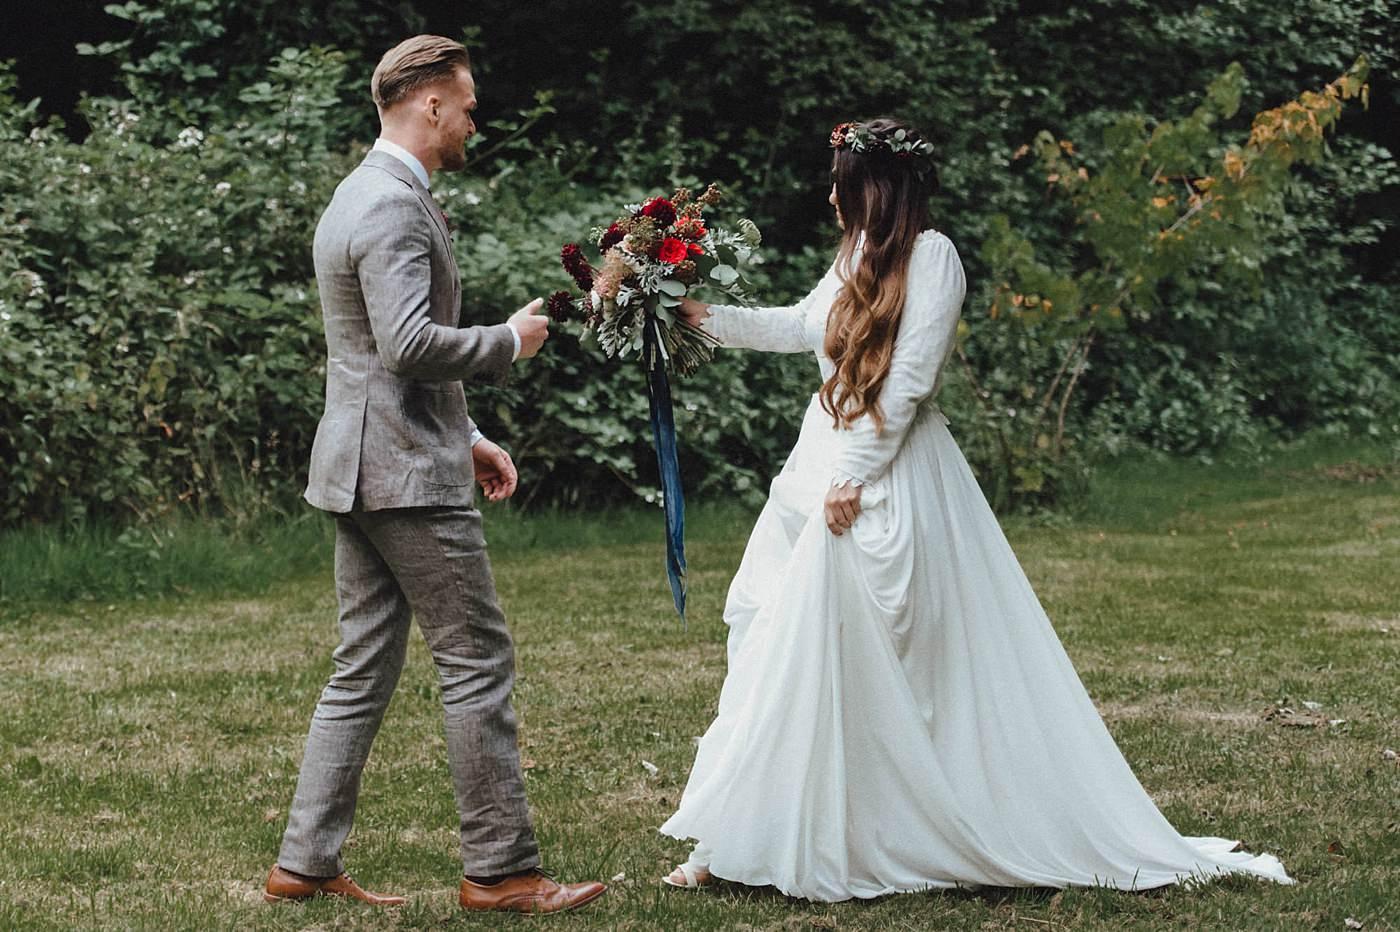 urban-elopement-wedding-98